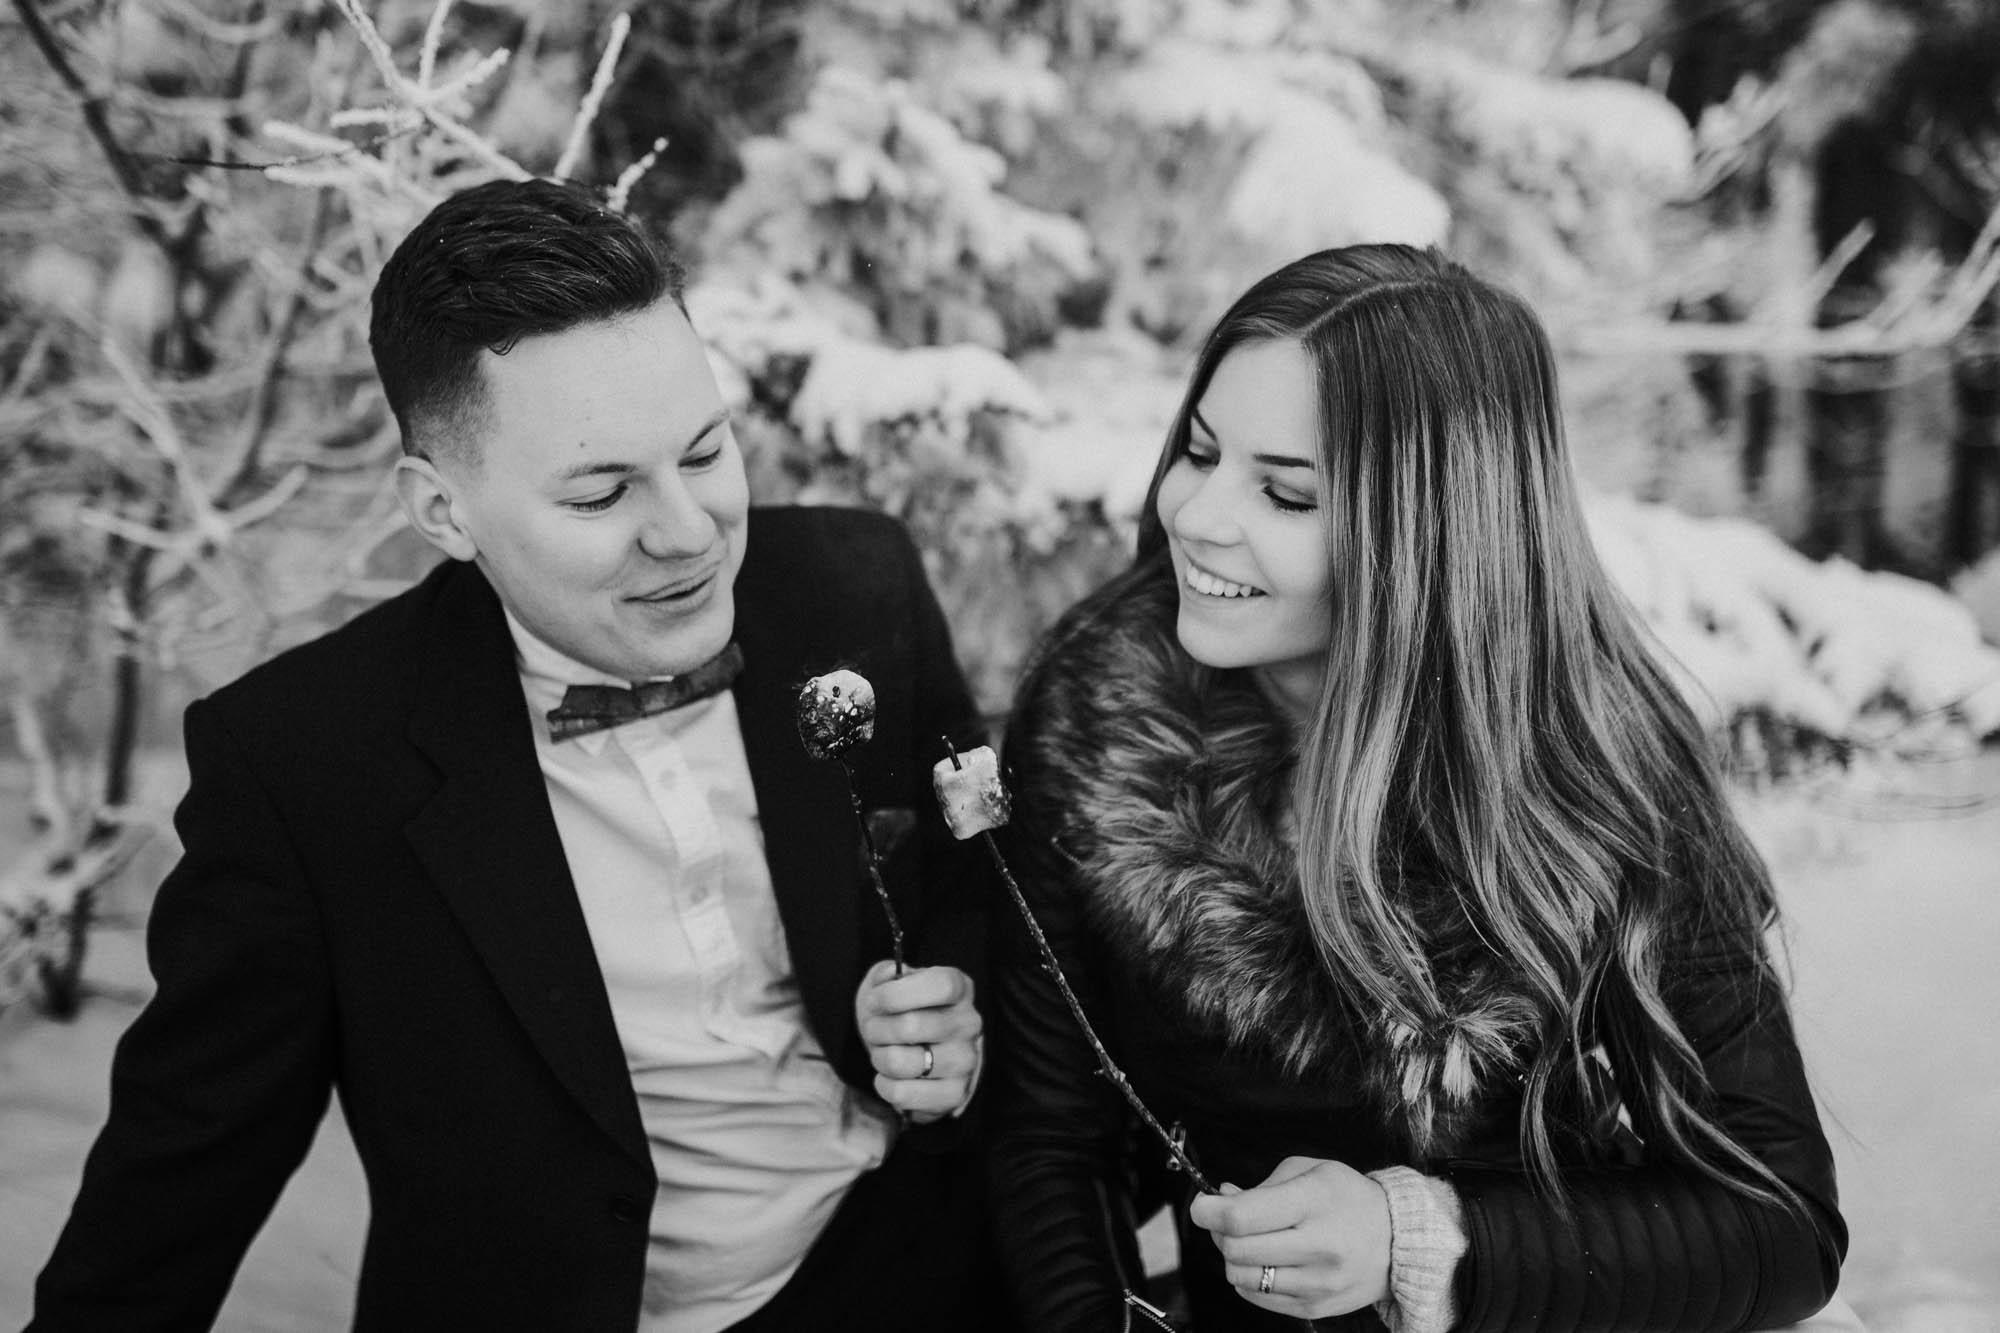 ashley_schulman_photography-winter_wedding_tampere-55.jpg